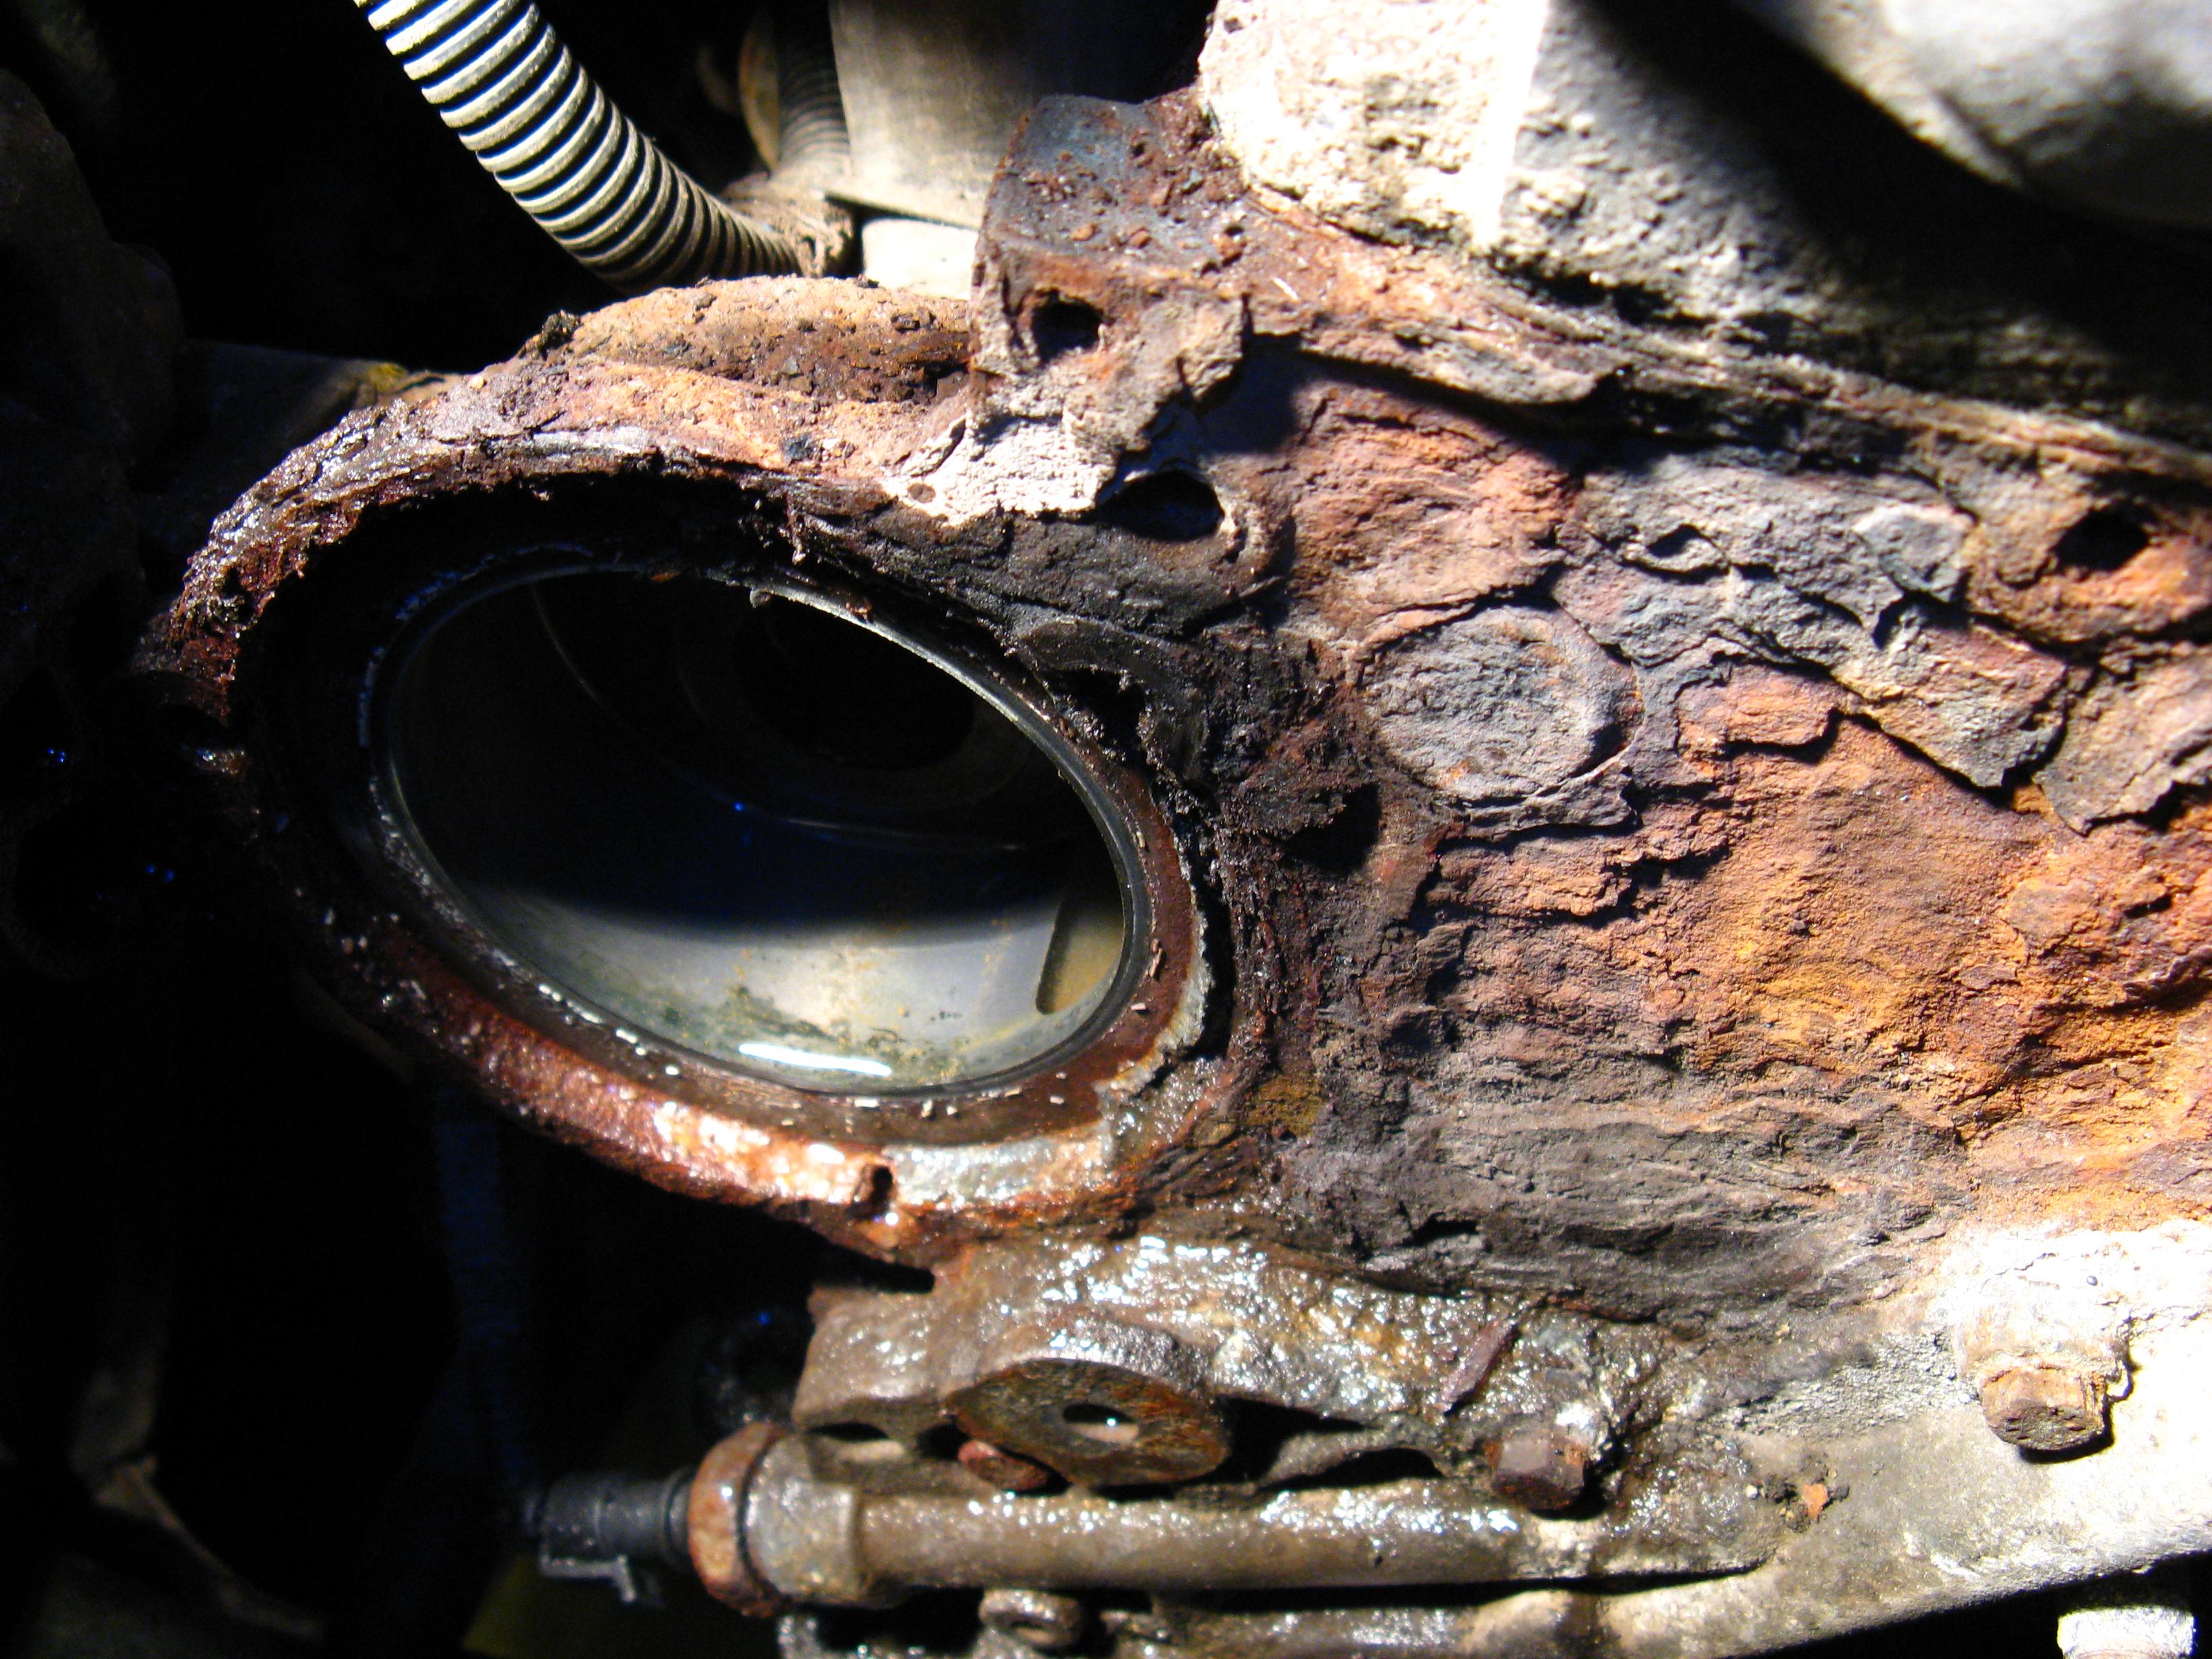 Fileopel Engine X14nz Rusty Block Near The Water Pump Opel Diagrams